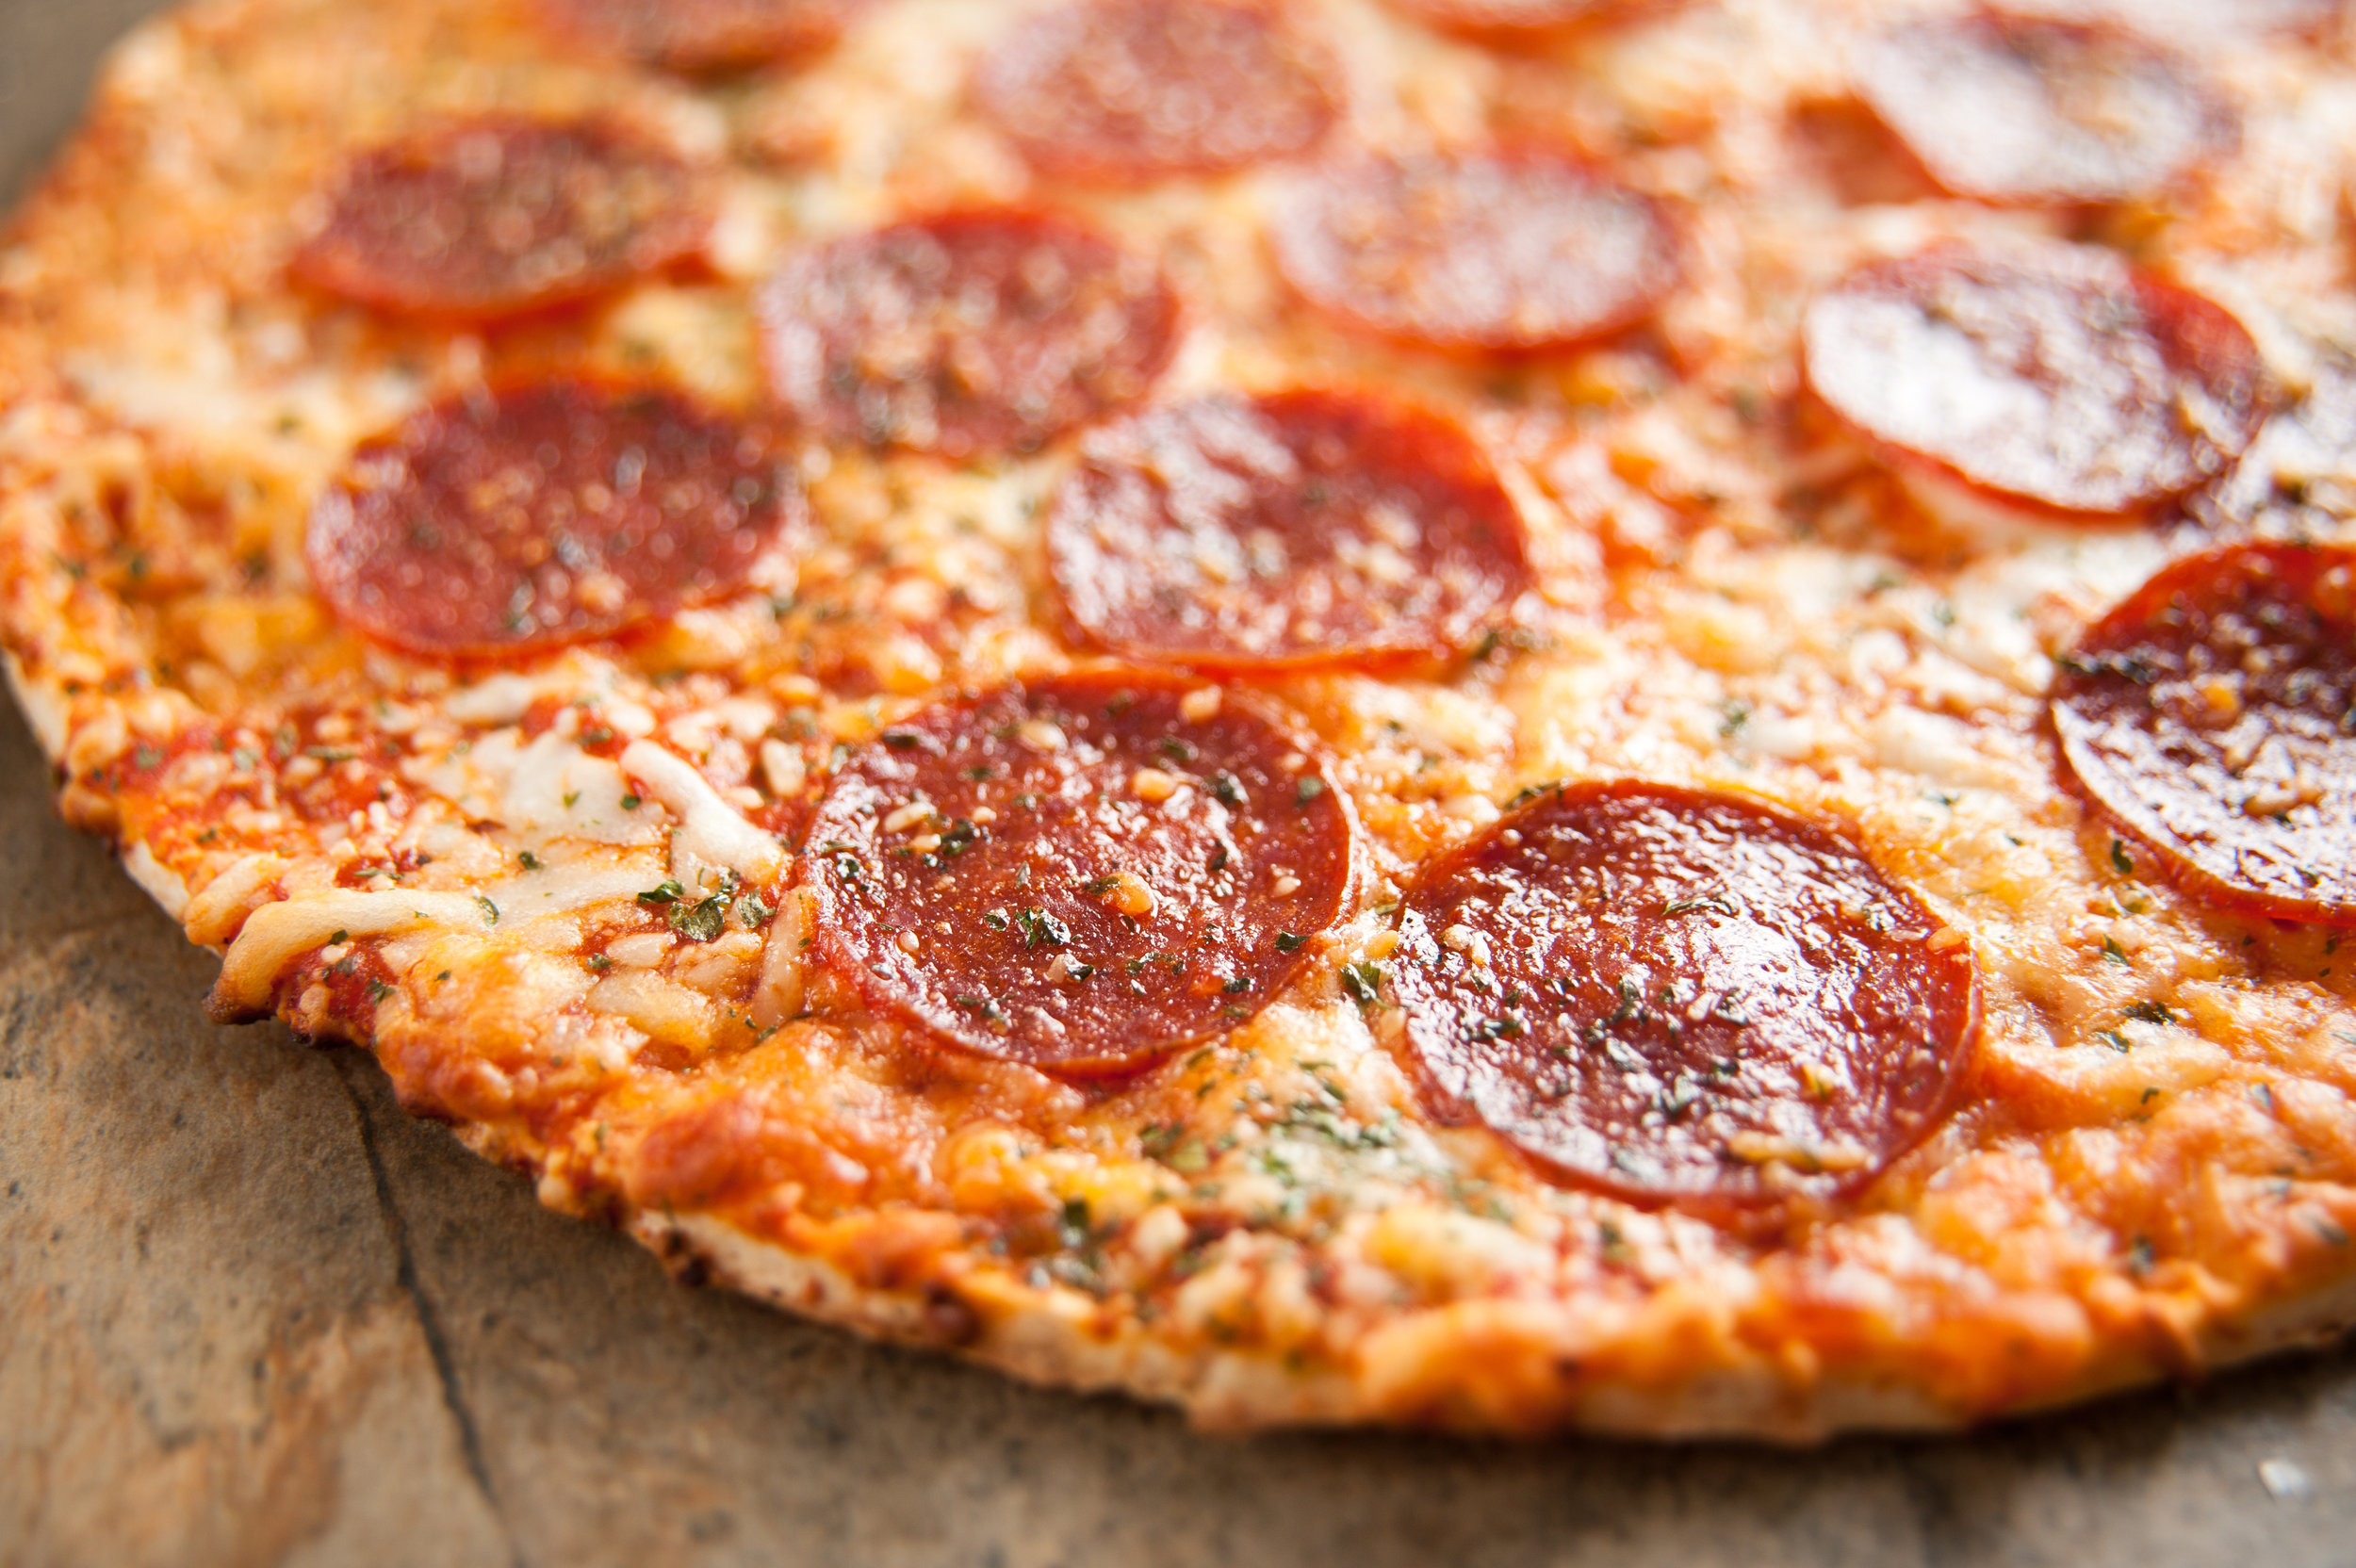 pepperoni pizza image2.jpg